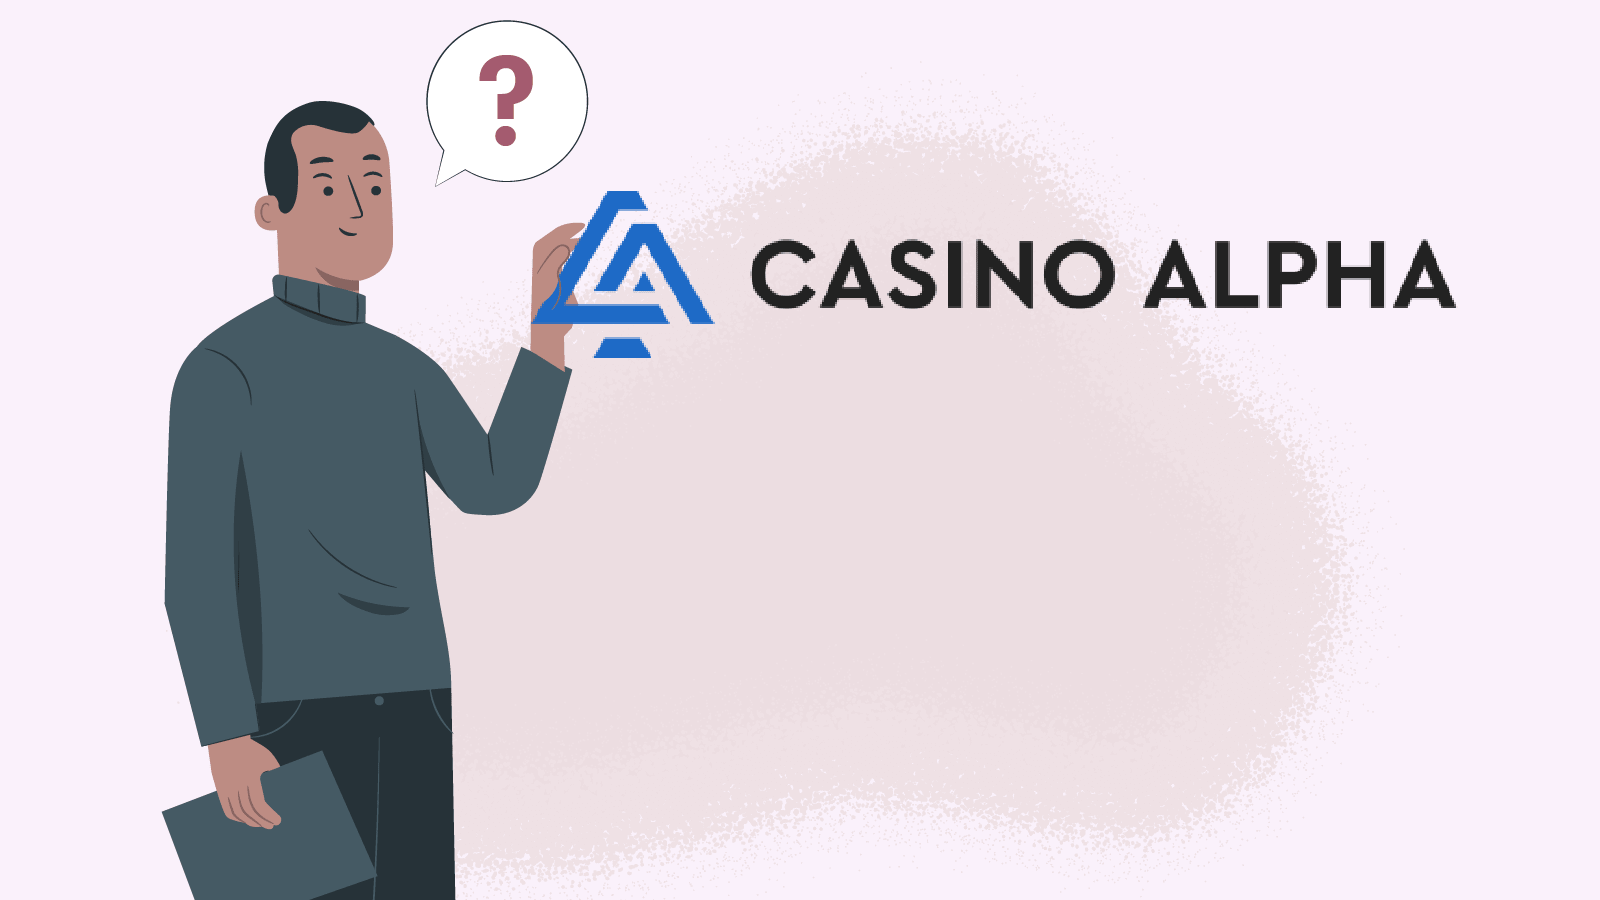 Why trust in CasinoAlpha